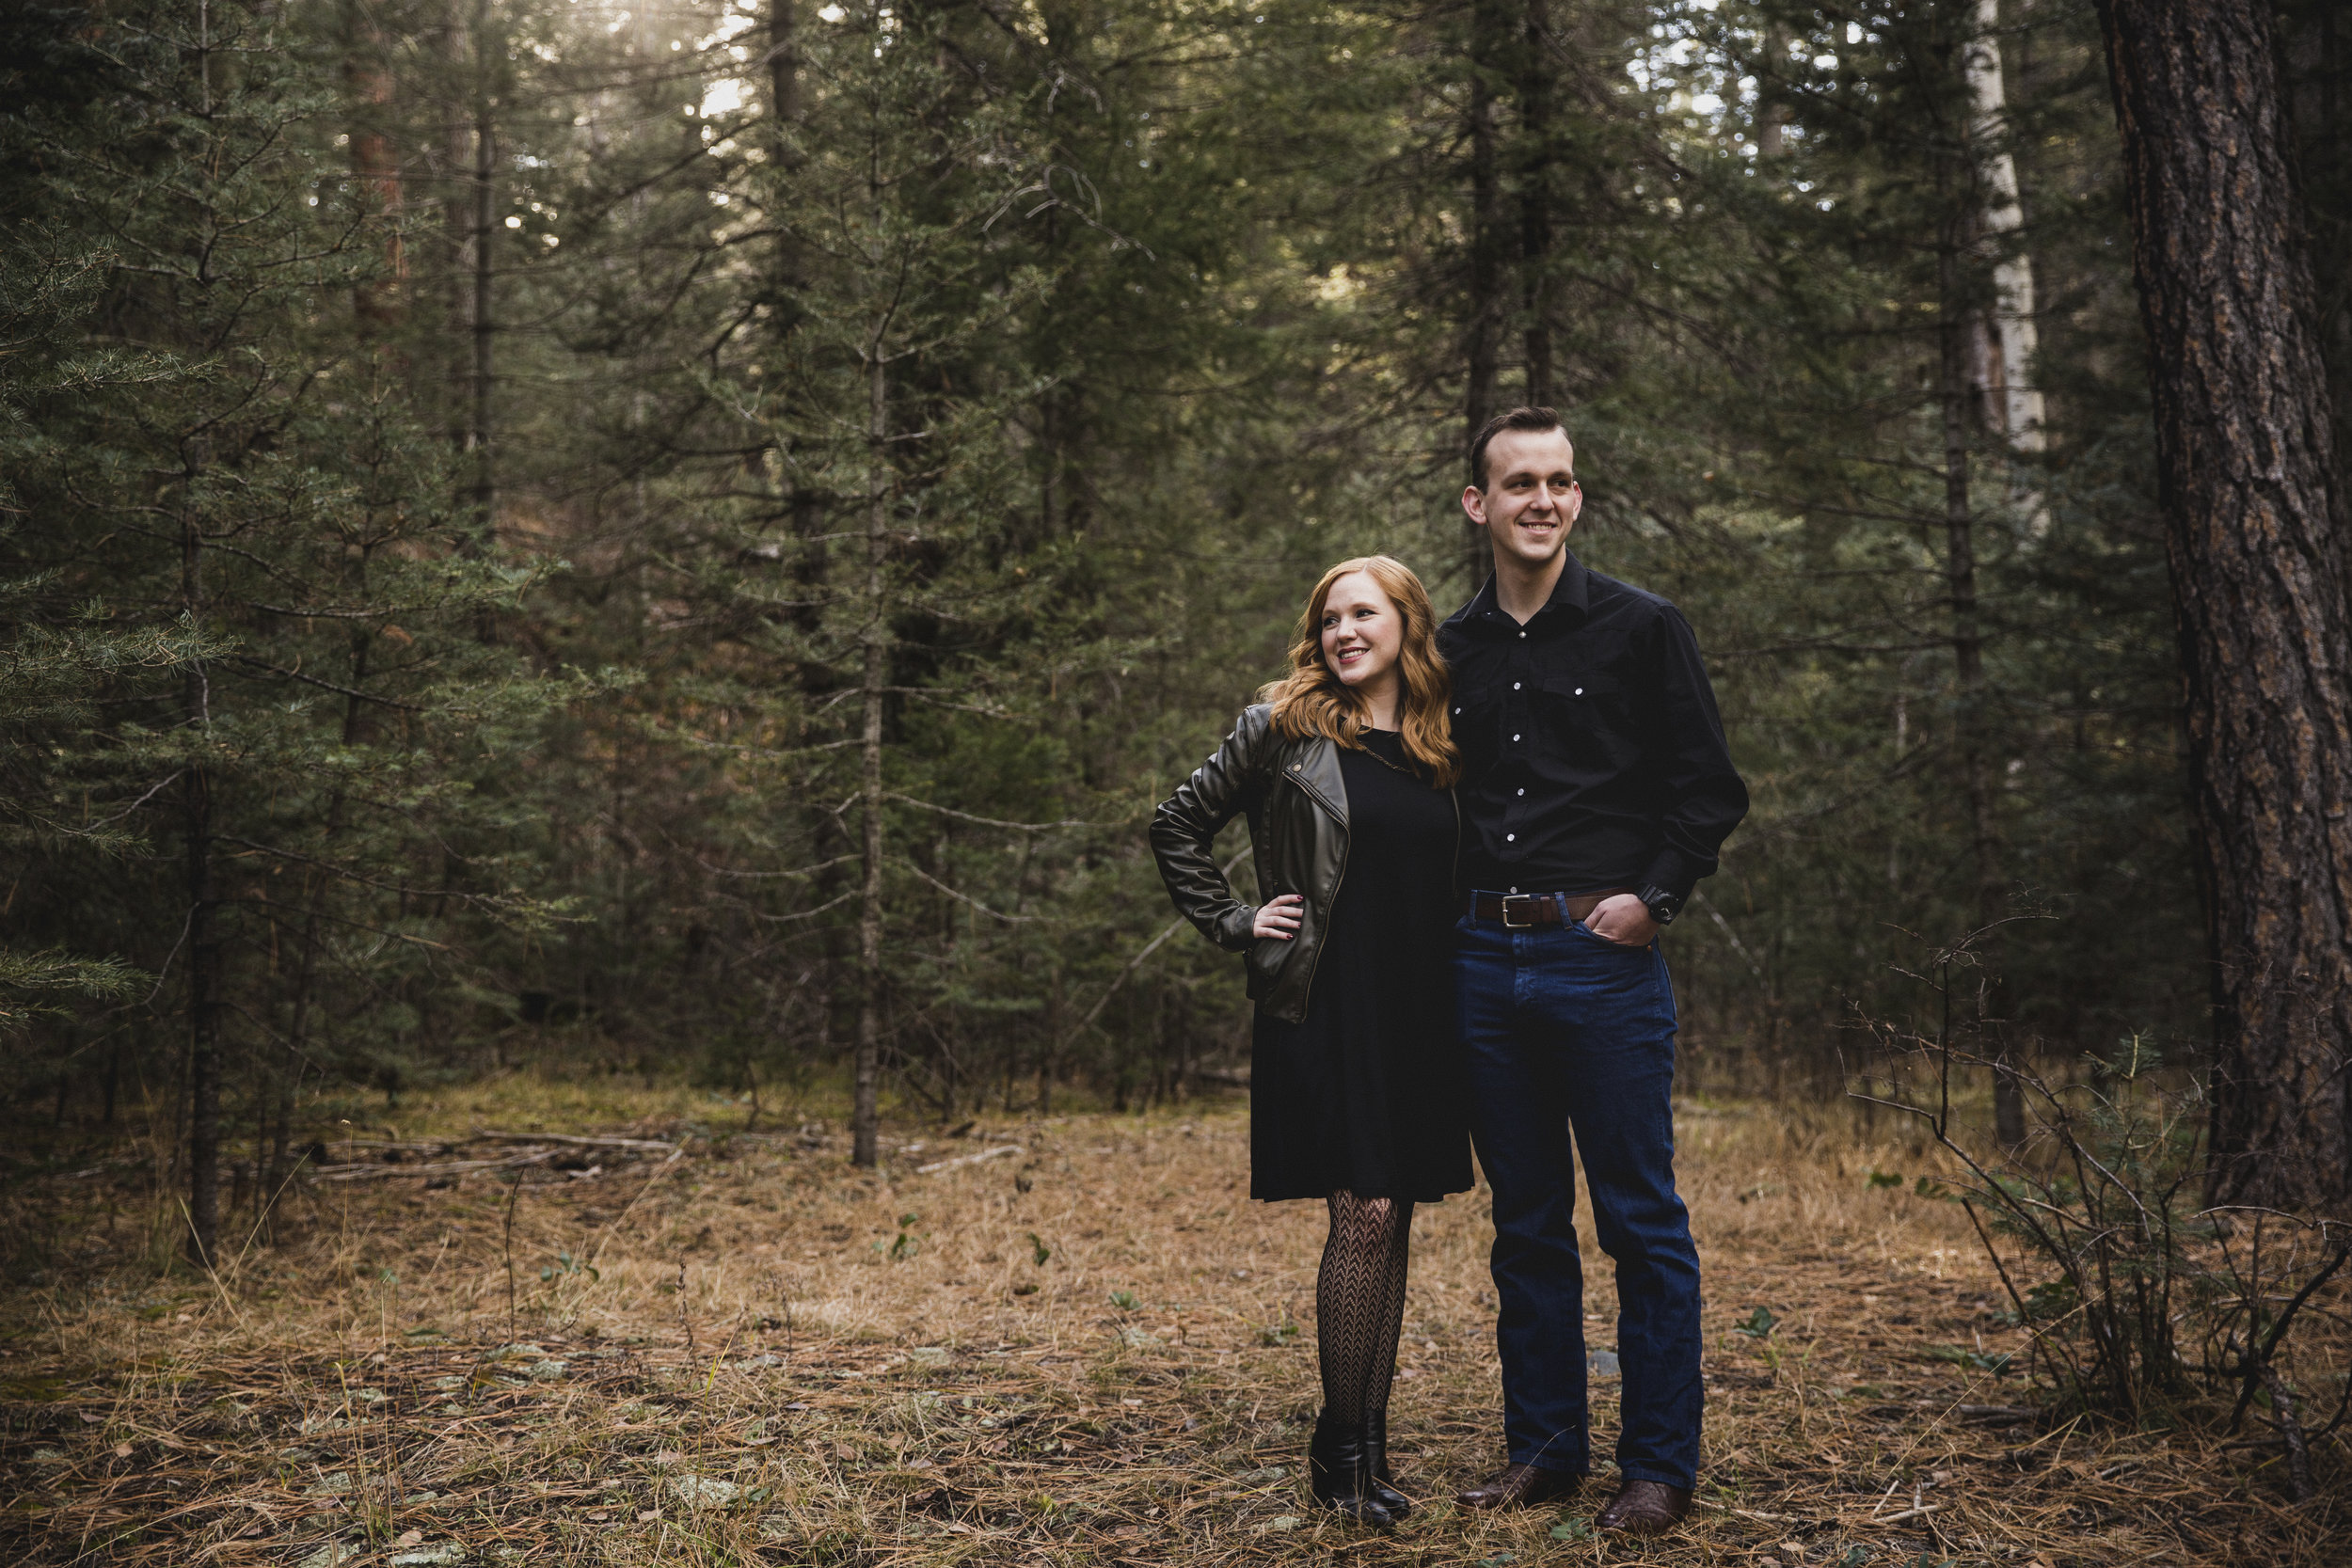 AB-LeahandAshtonphotography-Pagosa-Springs-Telluride-Wedding--7927.jpg